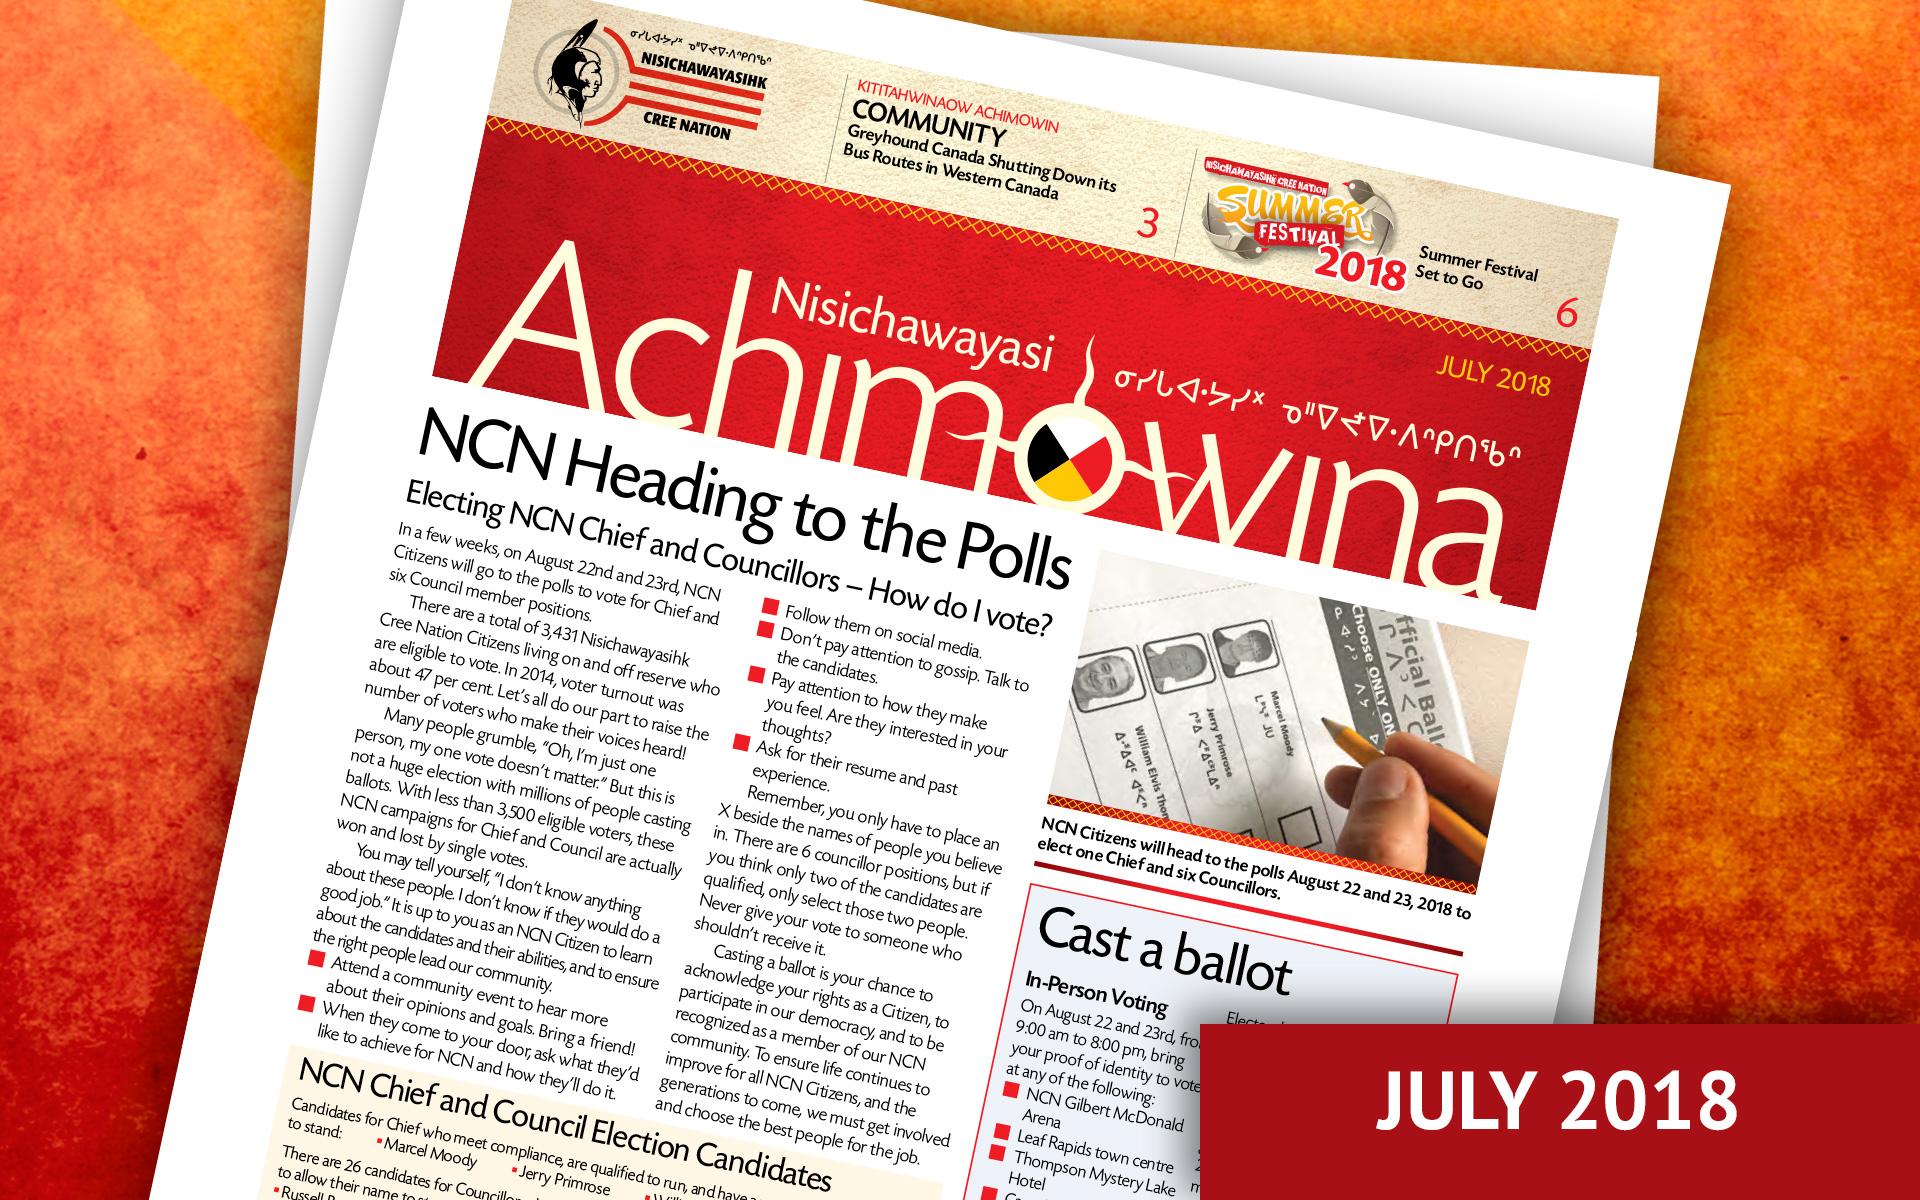 Achimowina July 2018 - NCN Heading to the Polls